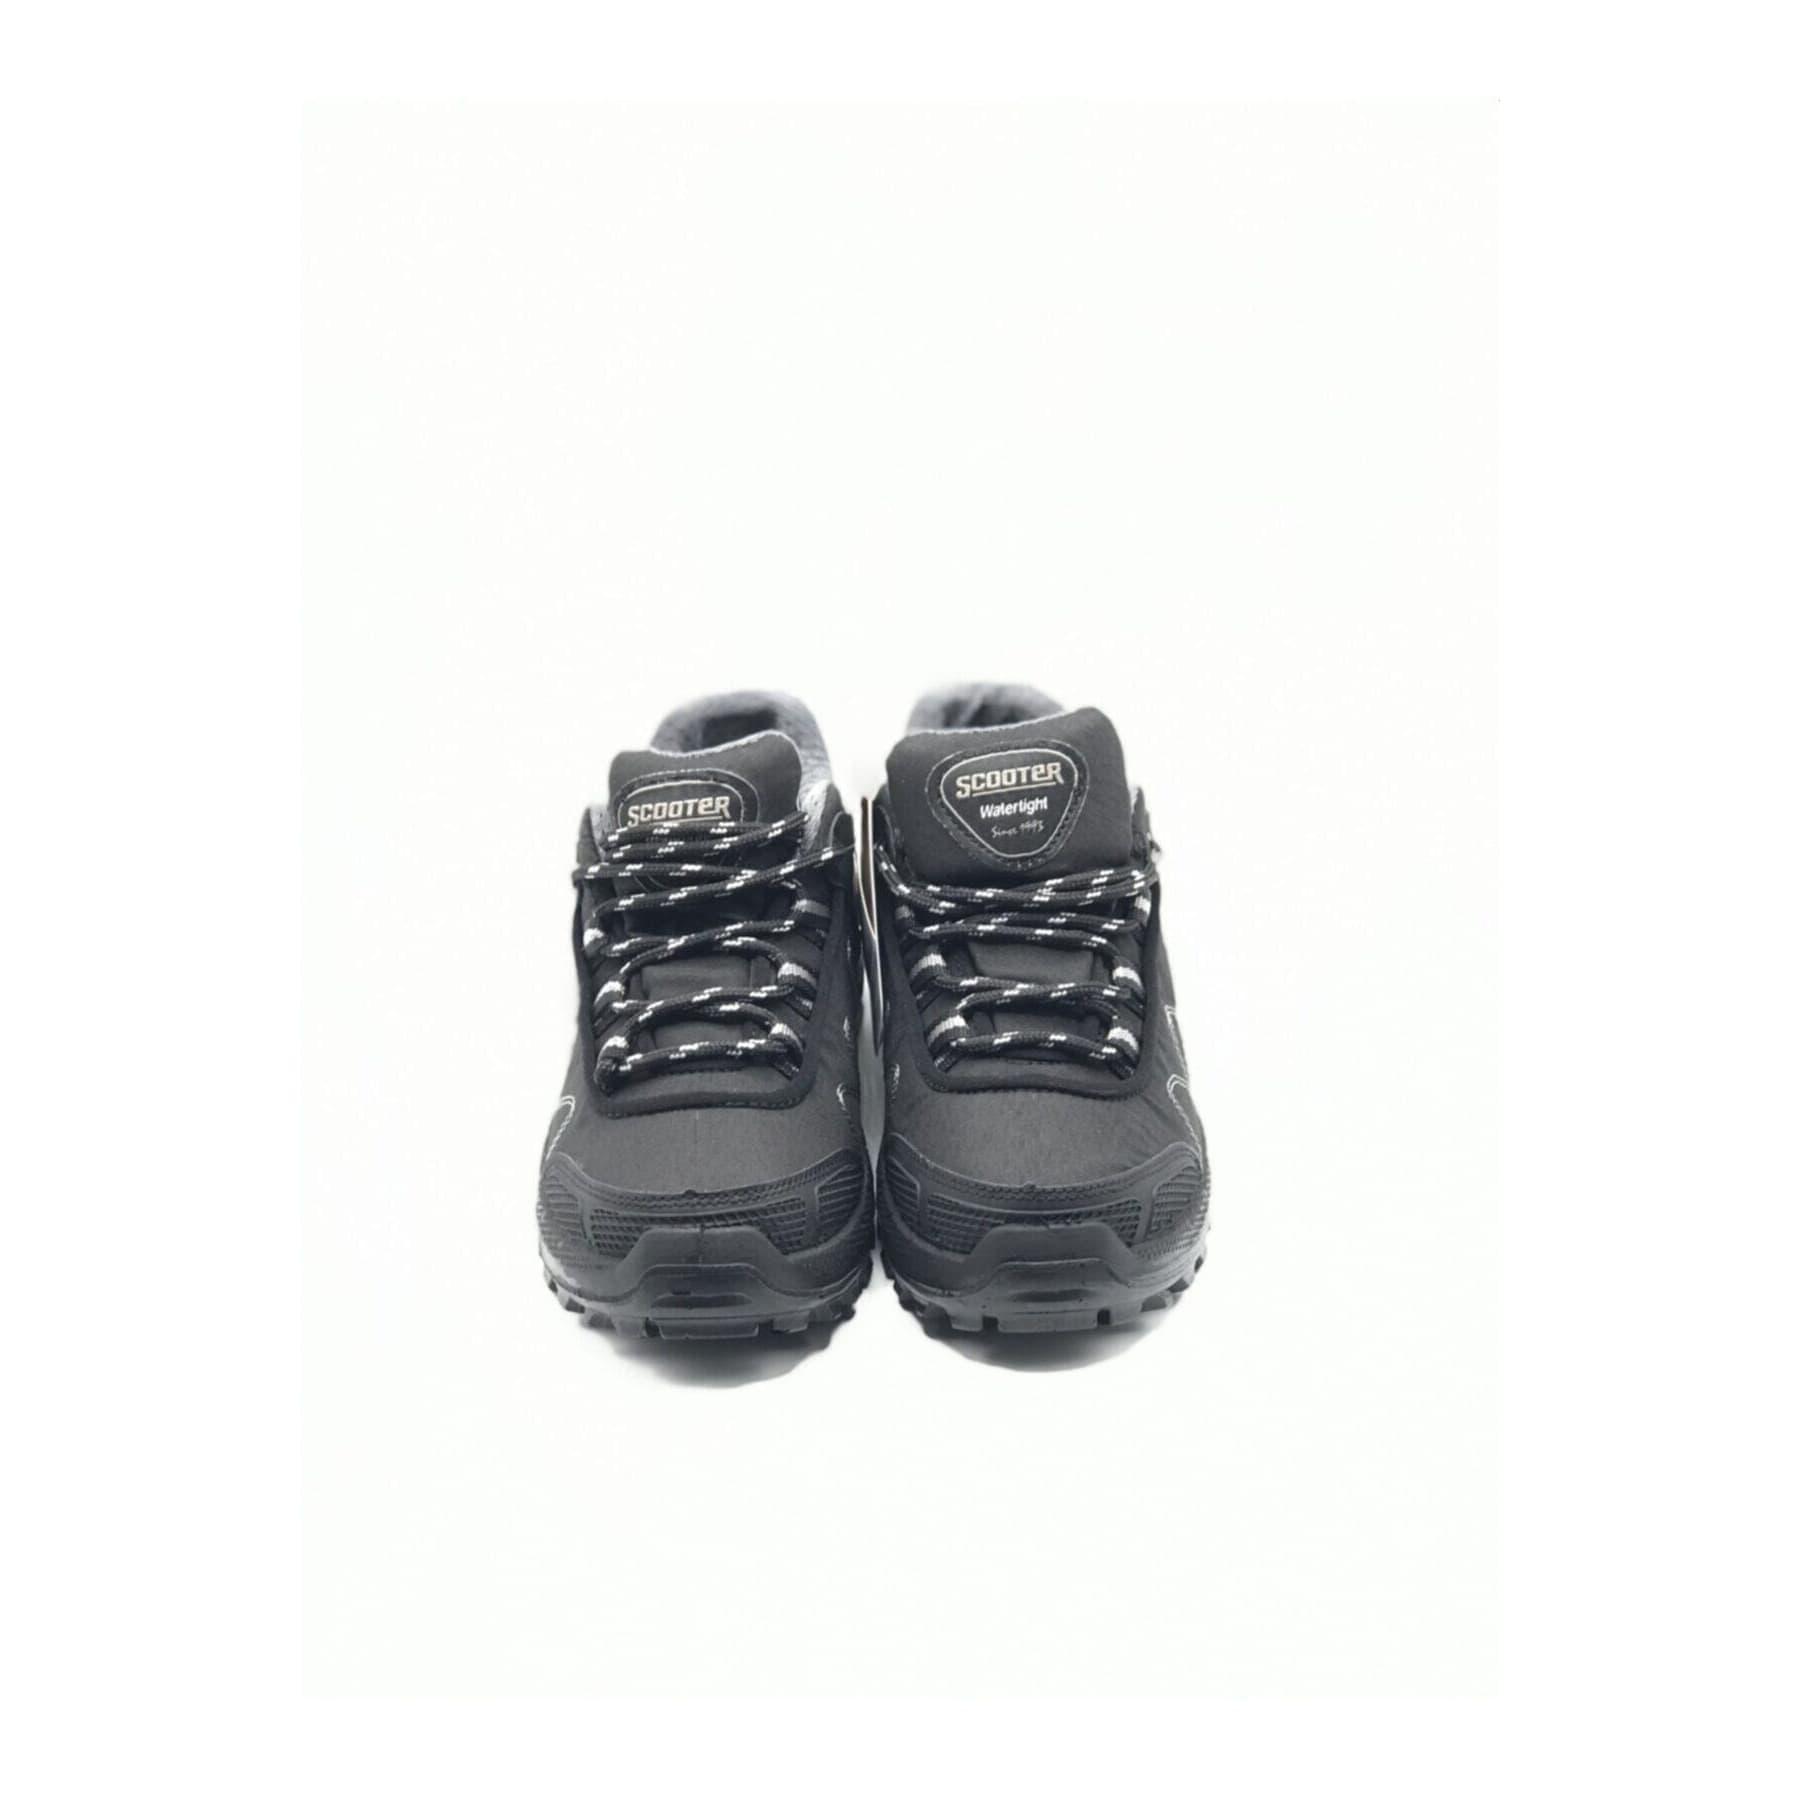 Atlantis Kadın Siyah Trakking Ayakkabısı (G1237TS)